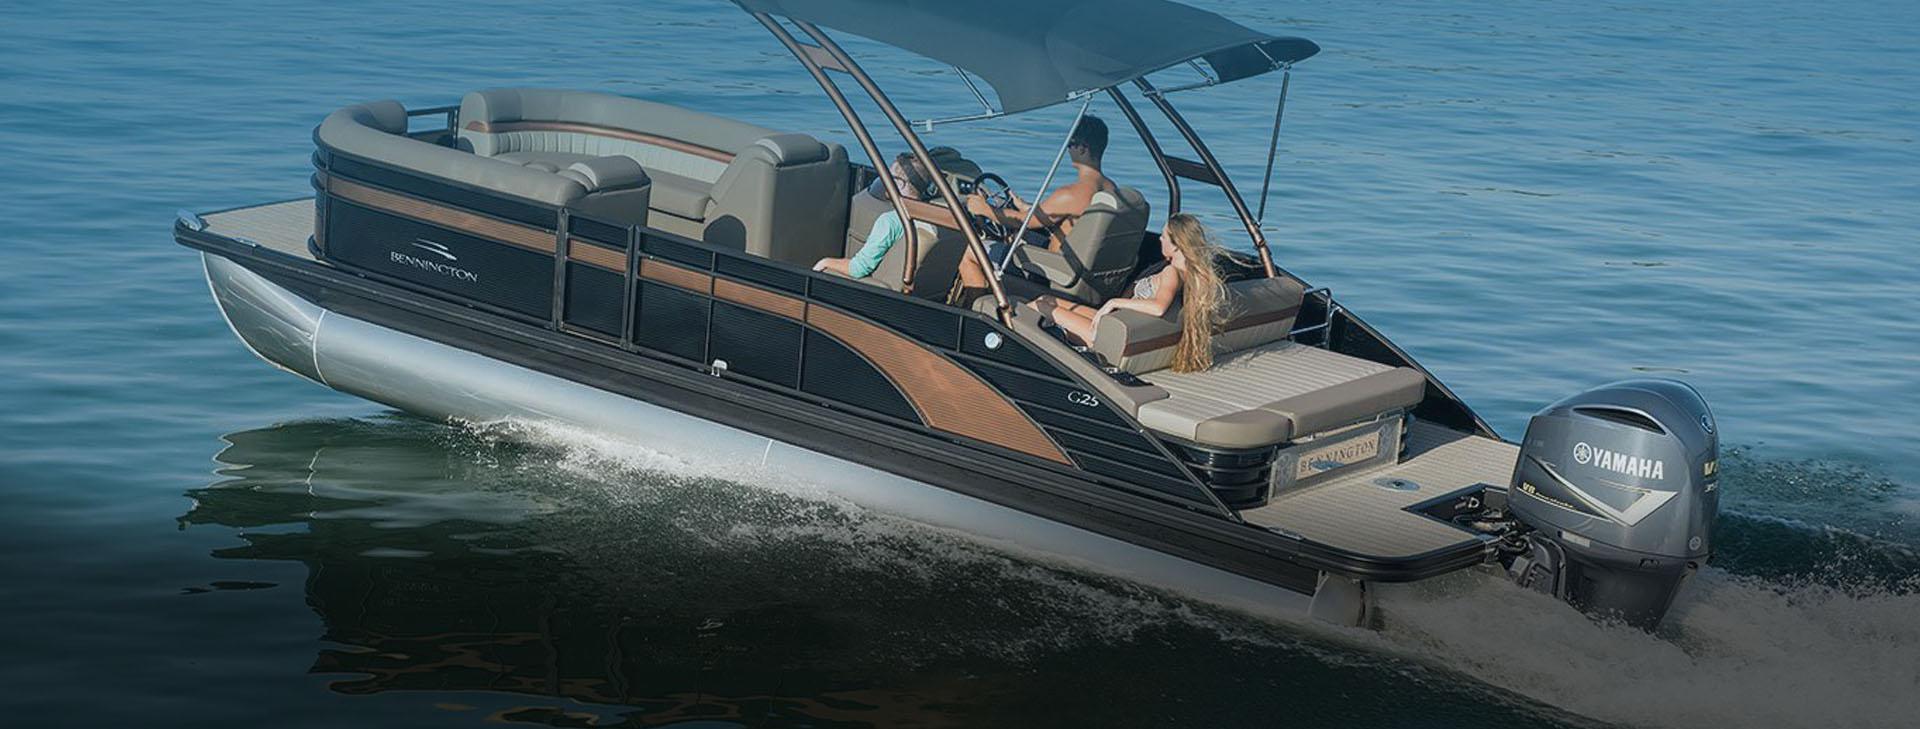 Kooper S Marine Llc New And Used Pontoon Boats For Sale